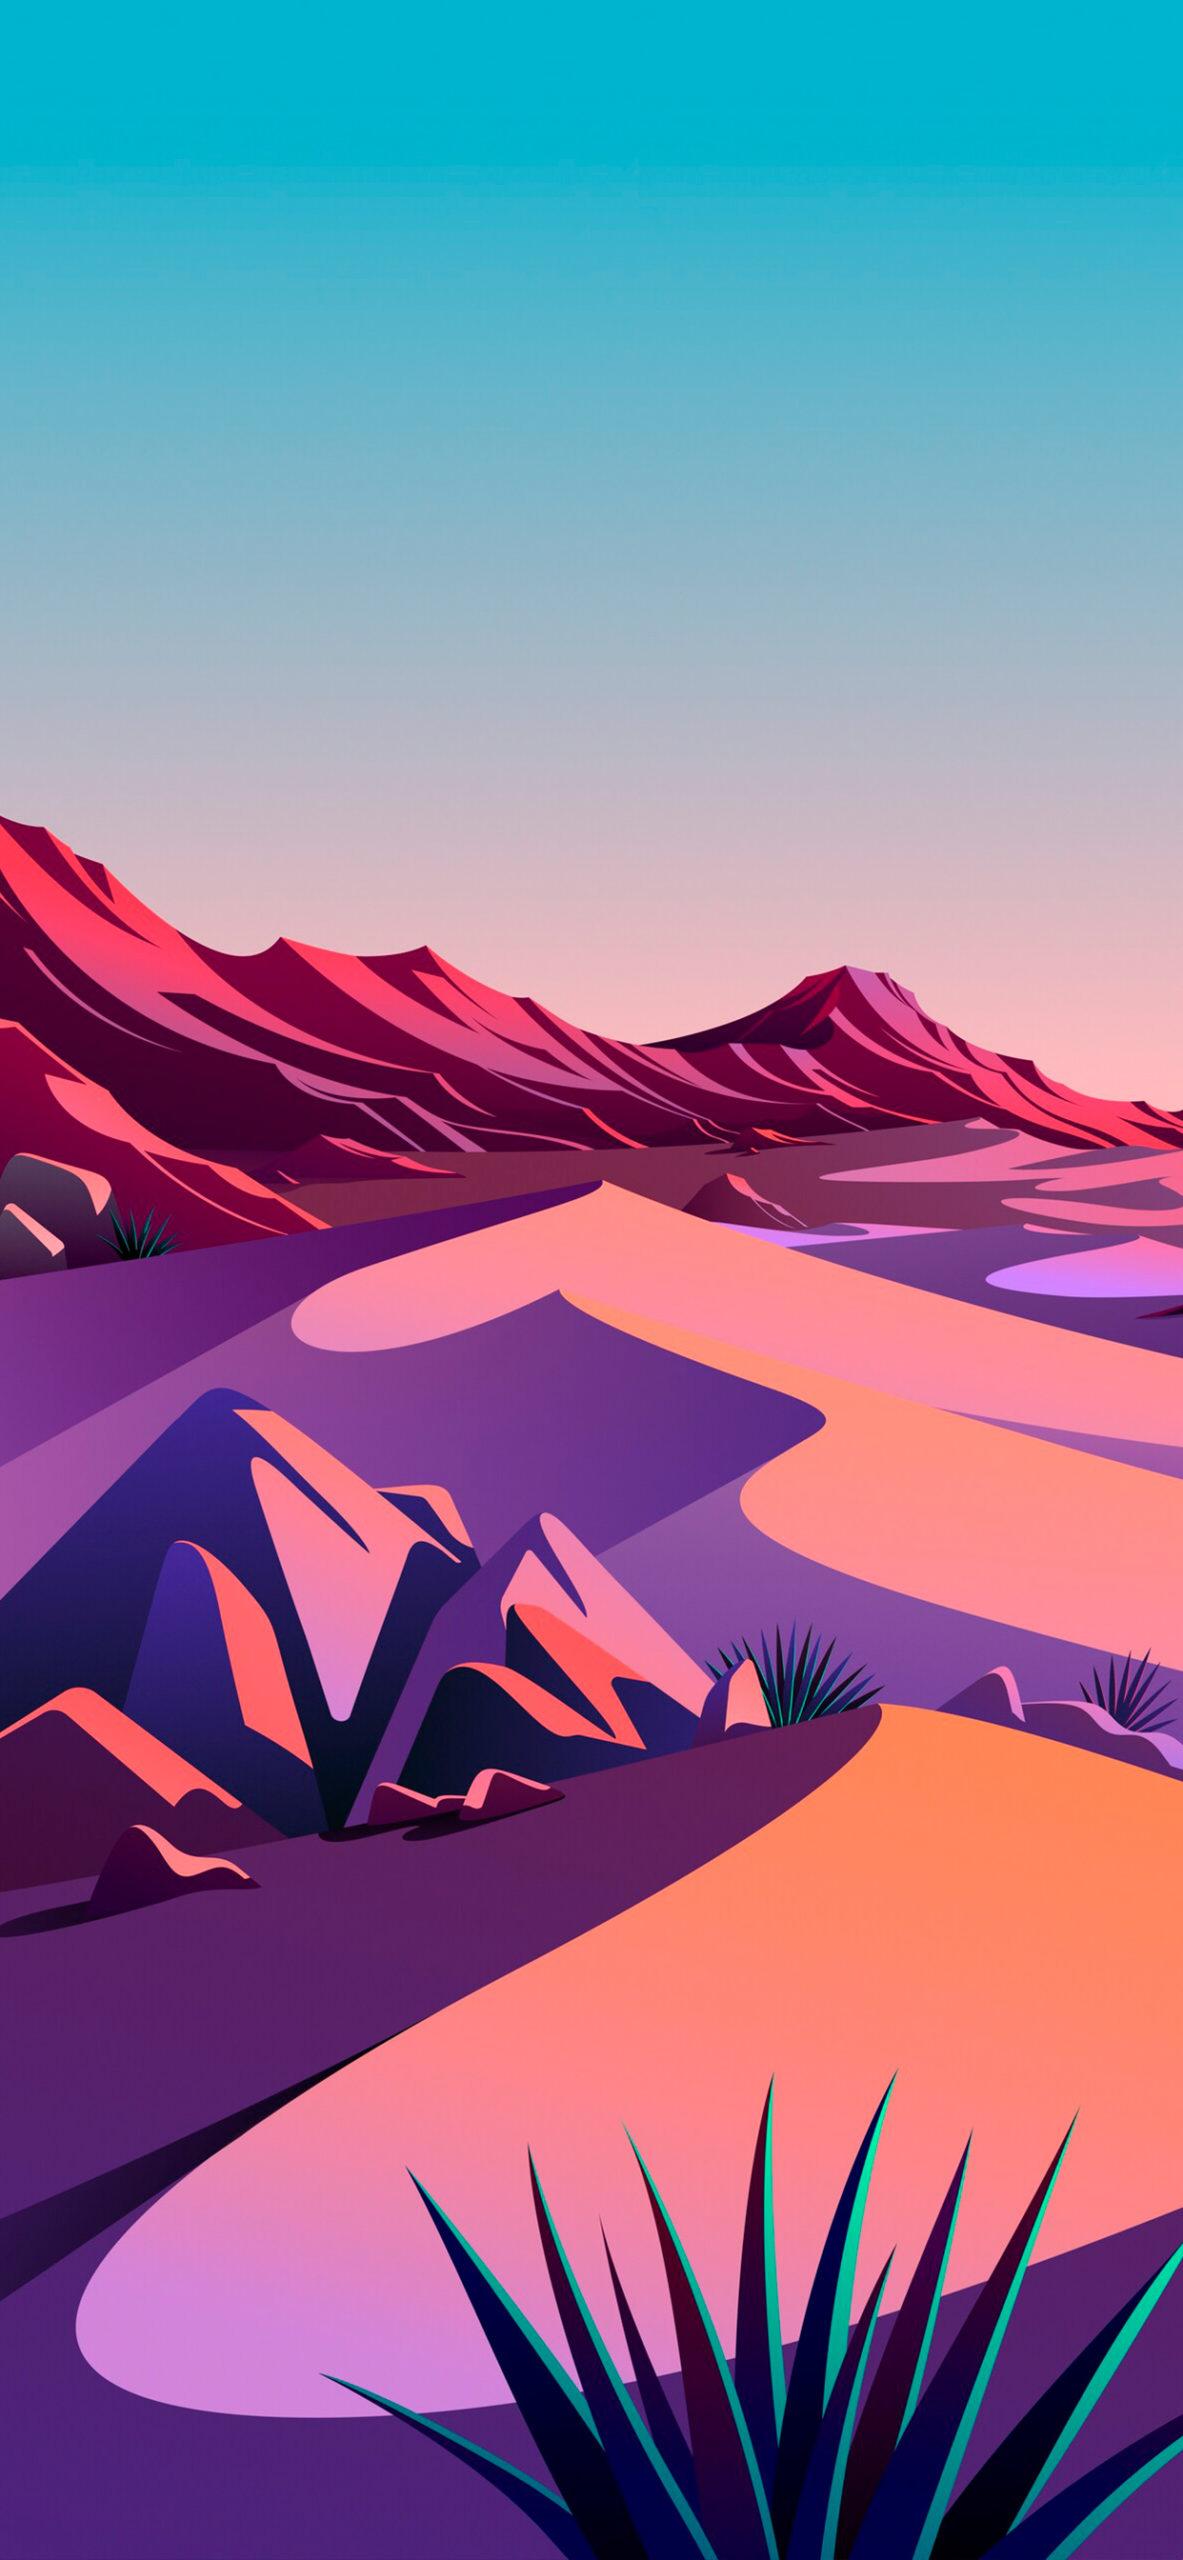 iphone wallpaper big sur desert4 scaled Mac OS Big Sur (Desert)